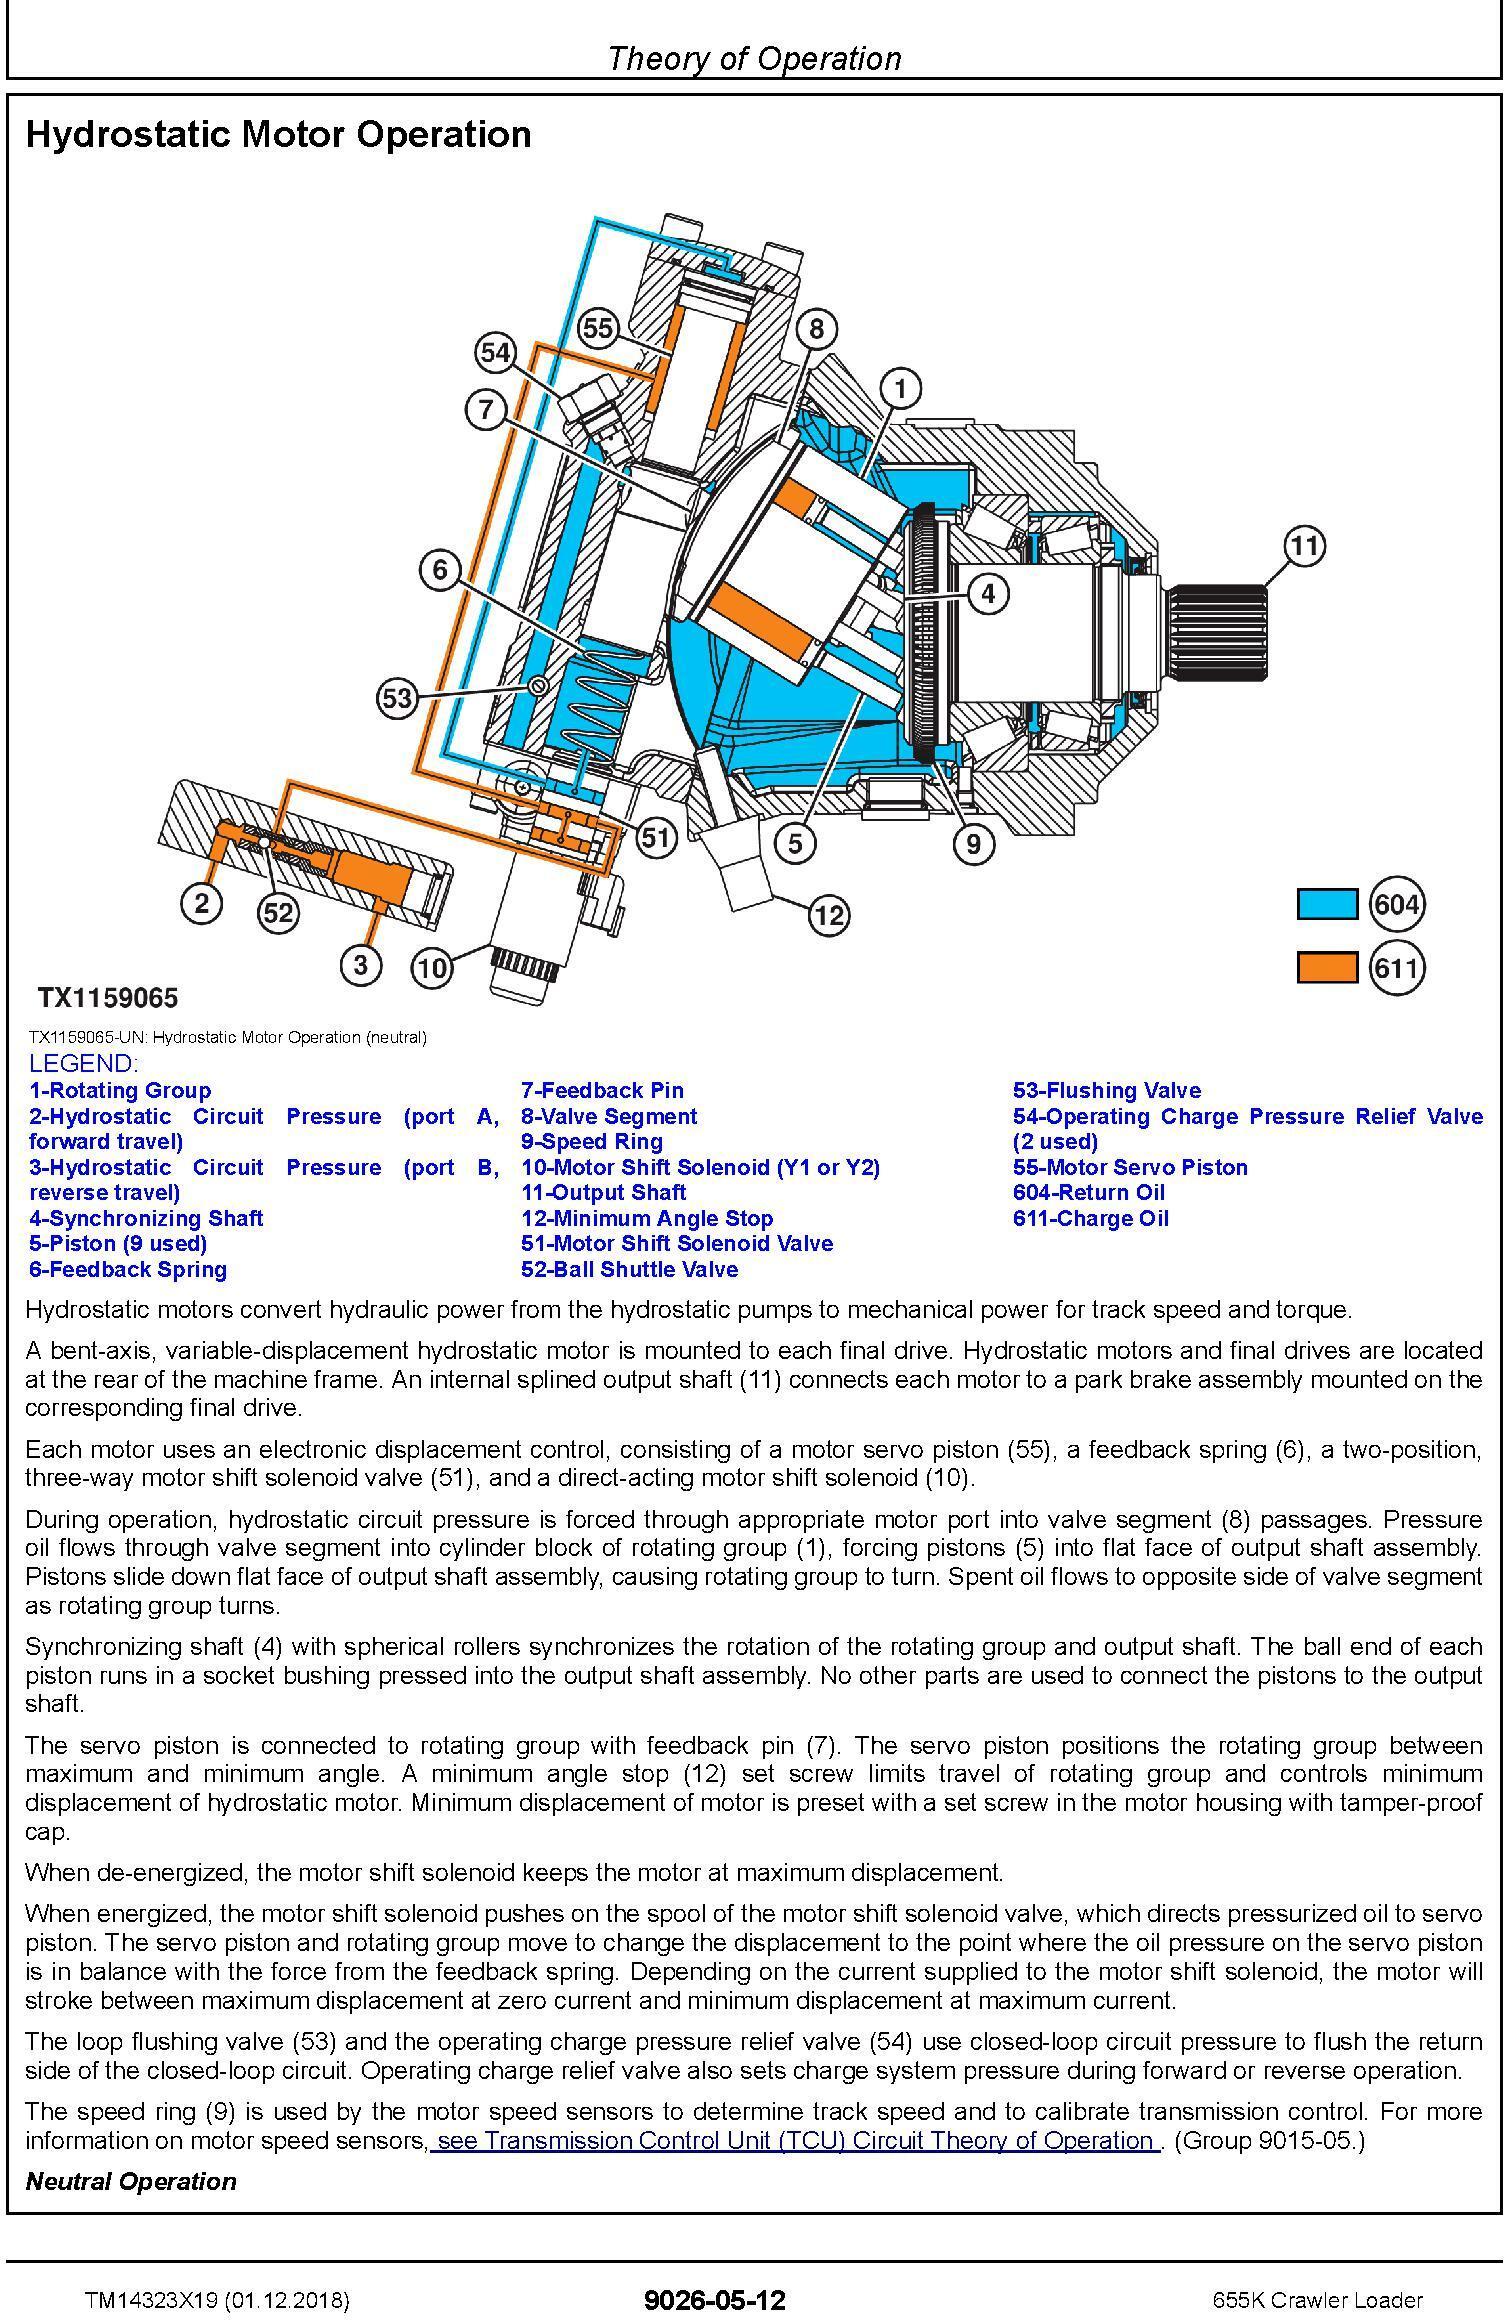 John Deere 655K Crawler Loader Operation & Test Technical Manual (TM14323X19) - 2